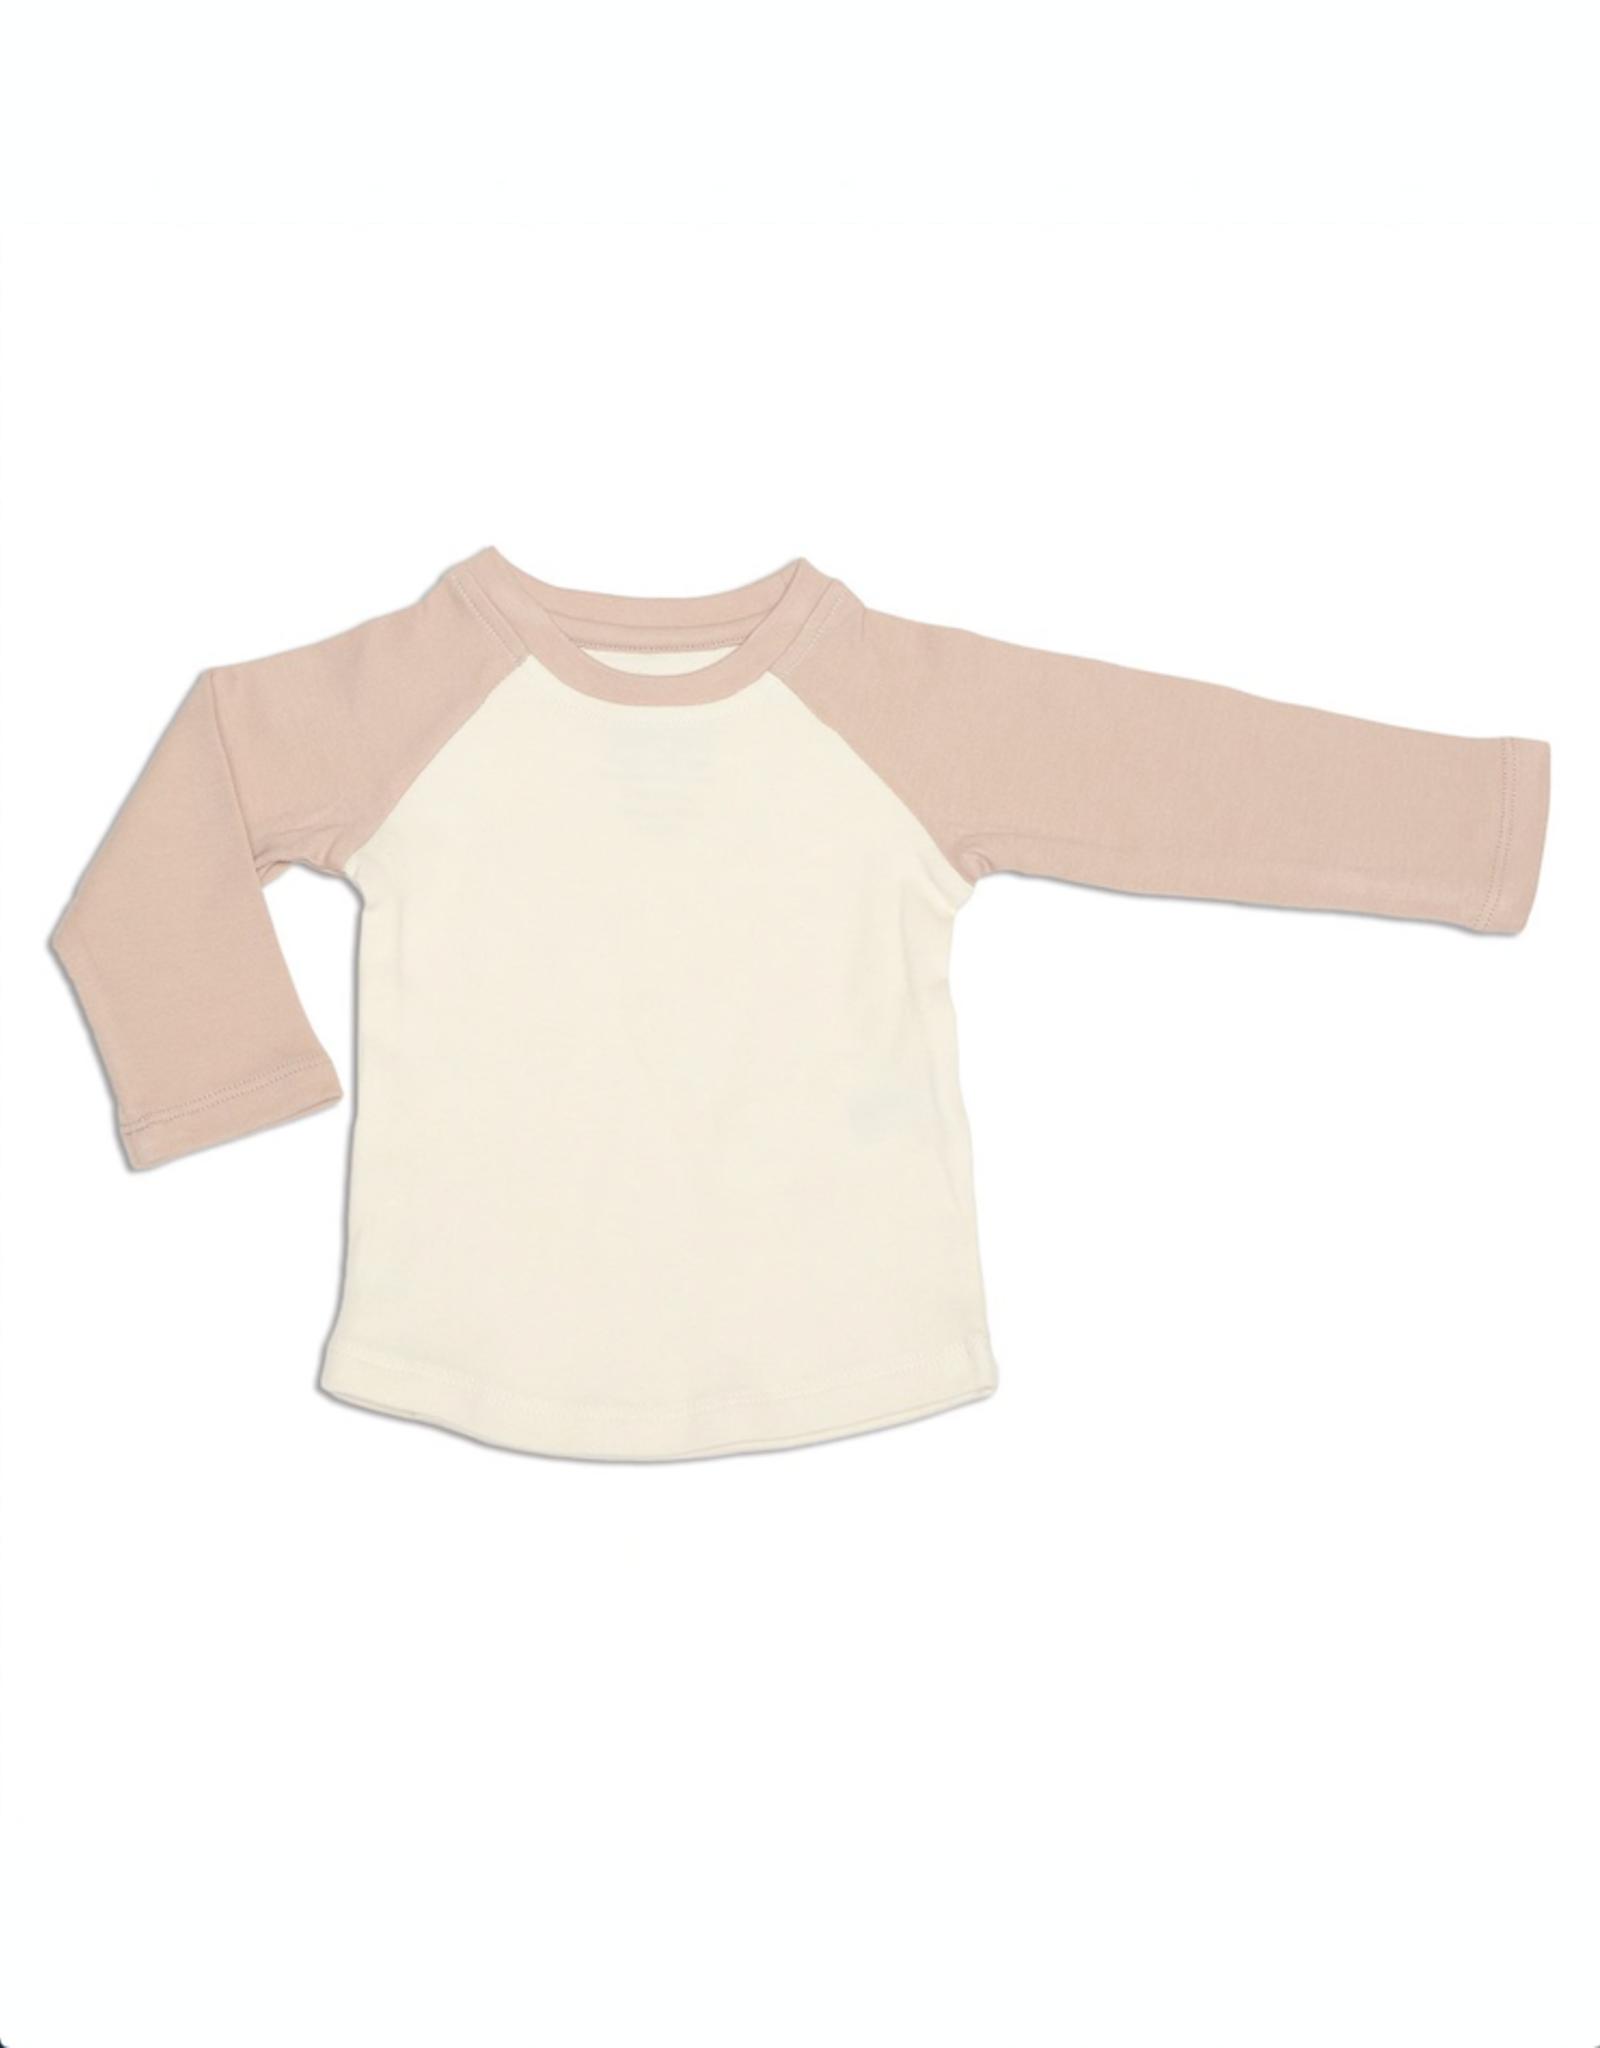 Silkberry Baby Silkberry Baby, Organic Cotton Baseball Tee, Papyrus/Rose Dust